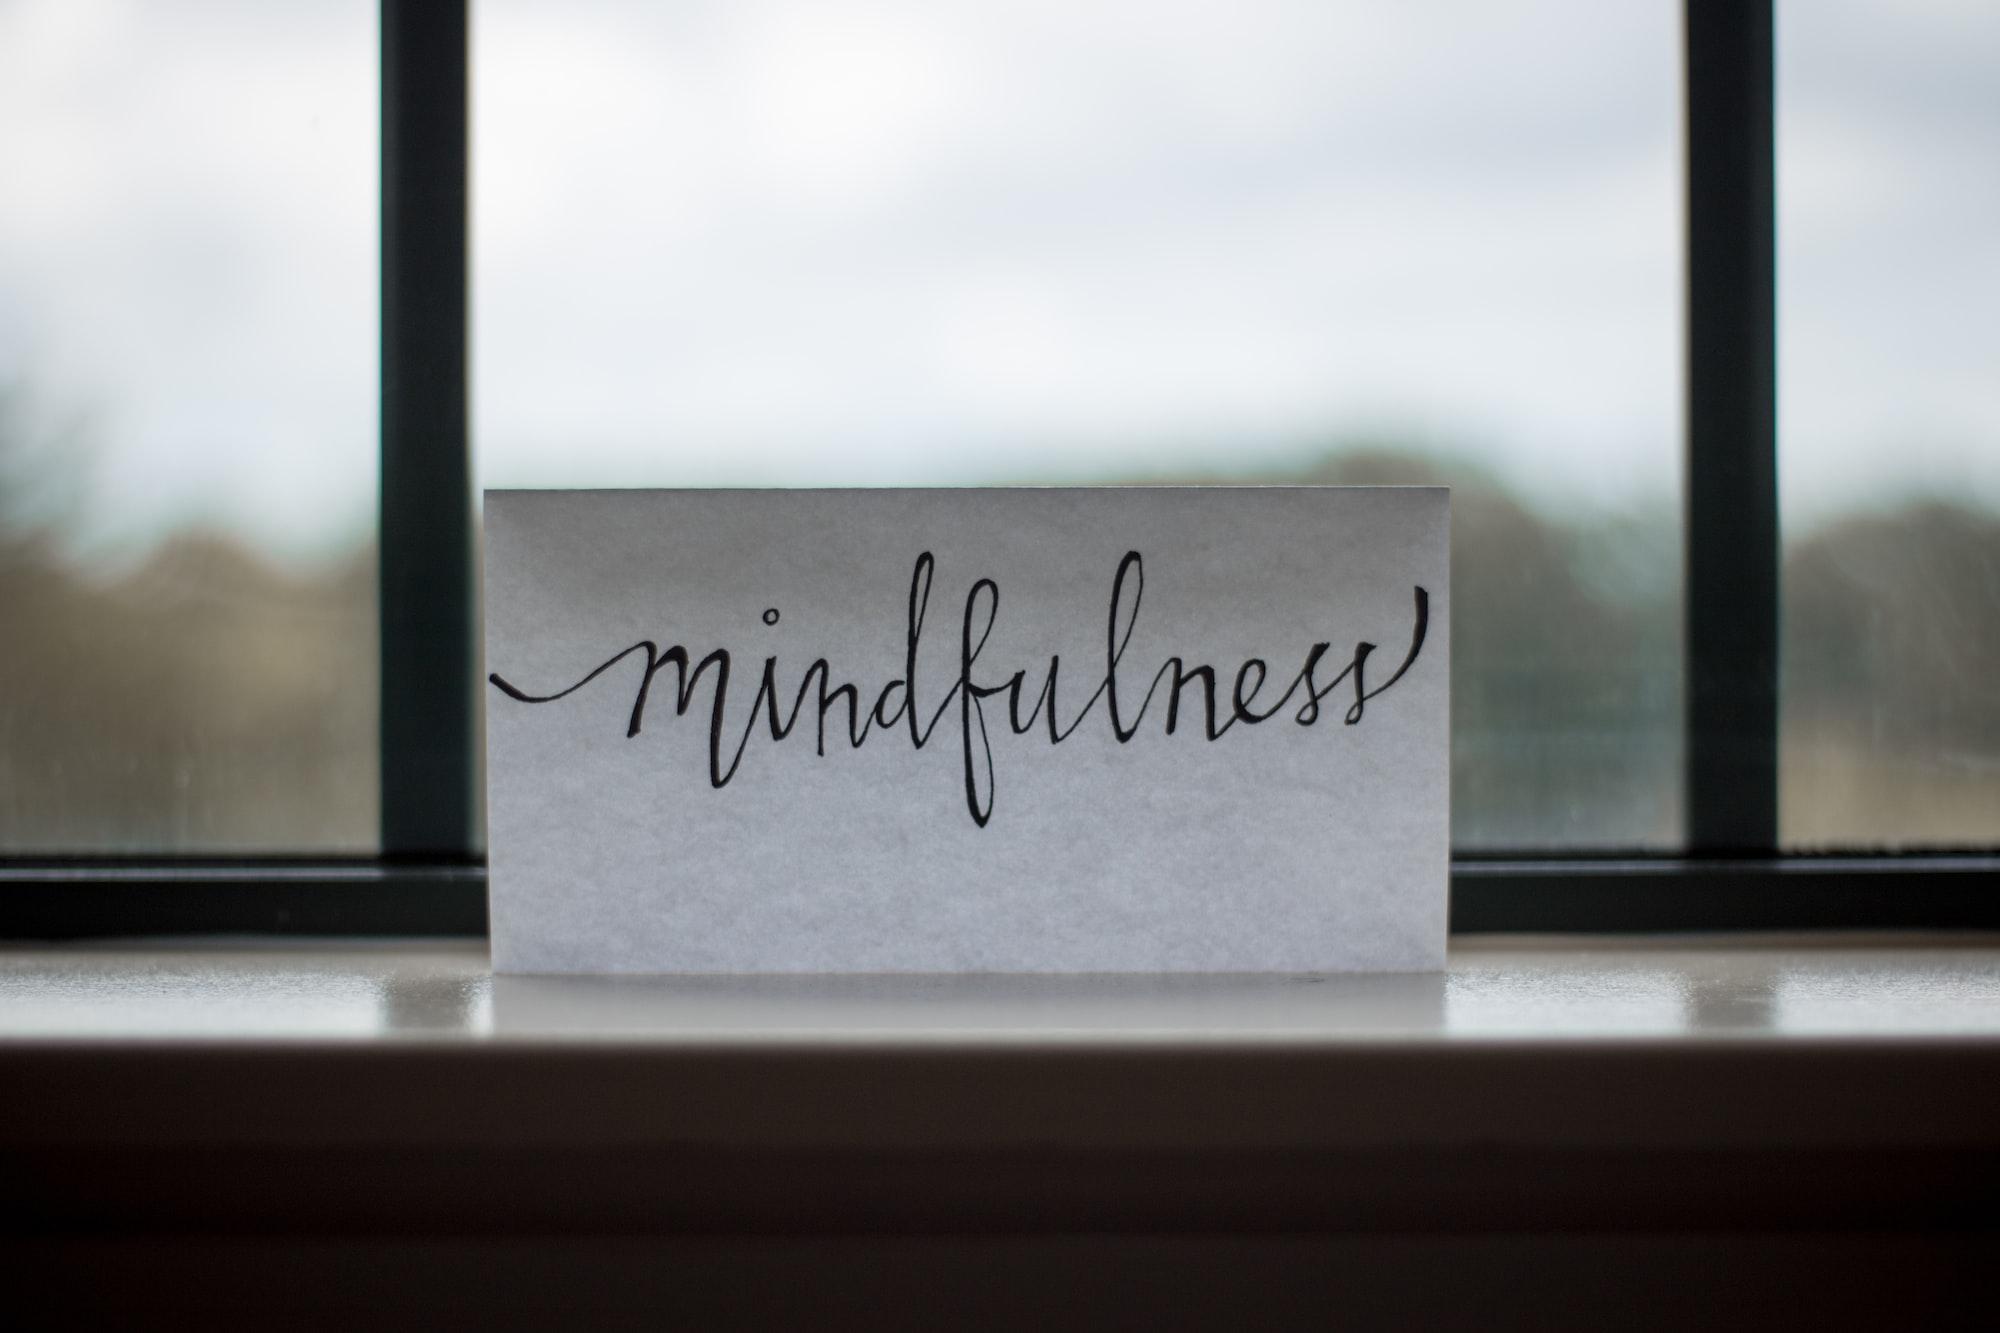 Top 10 Best Meditation Classes in London